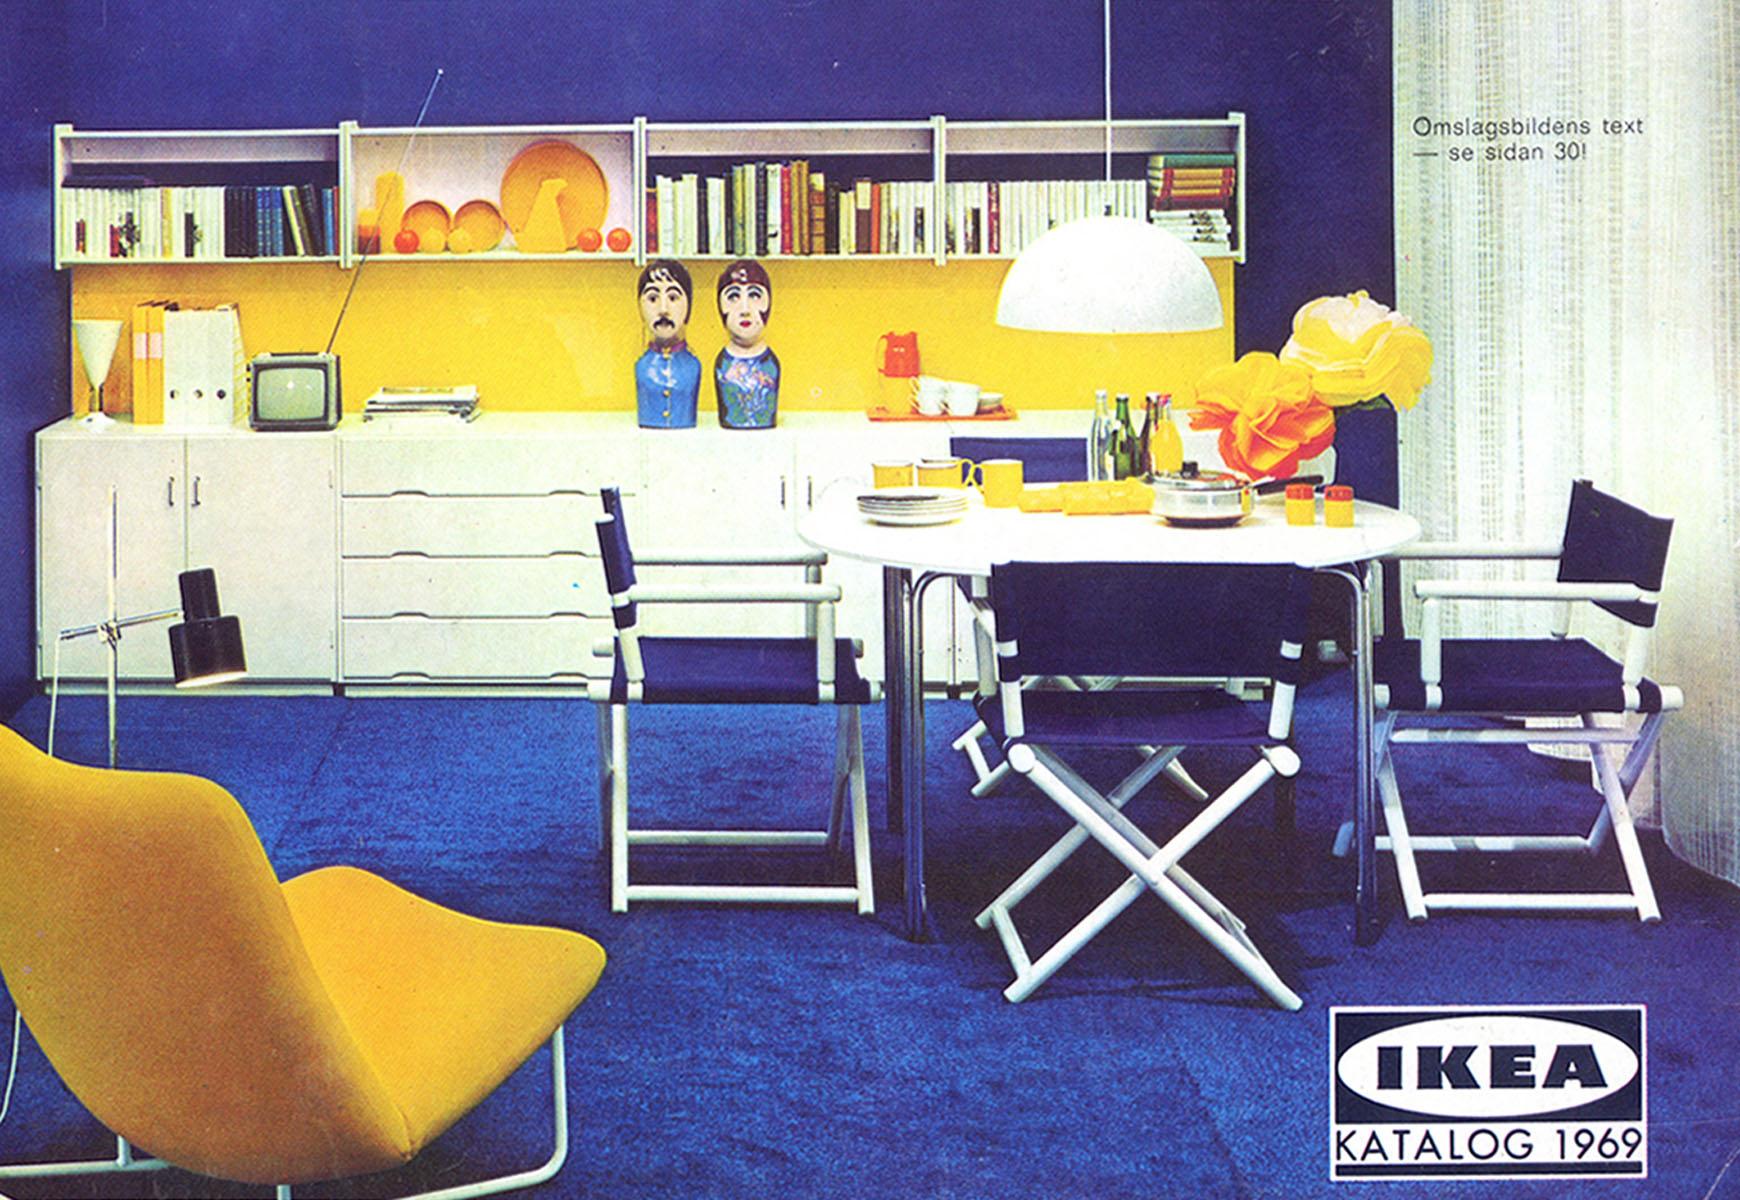 IKEA Catalog Covers from 1951-2018  IKEA Catalog Co...